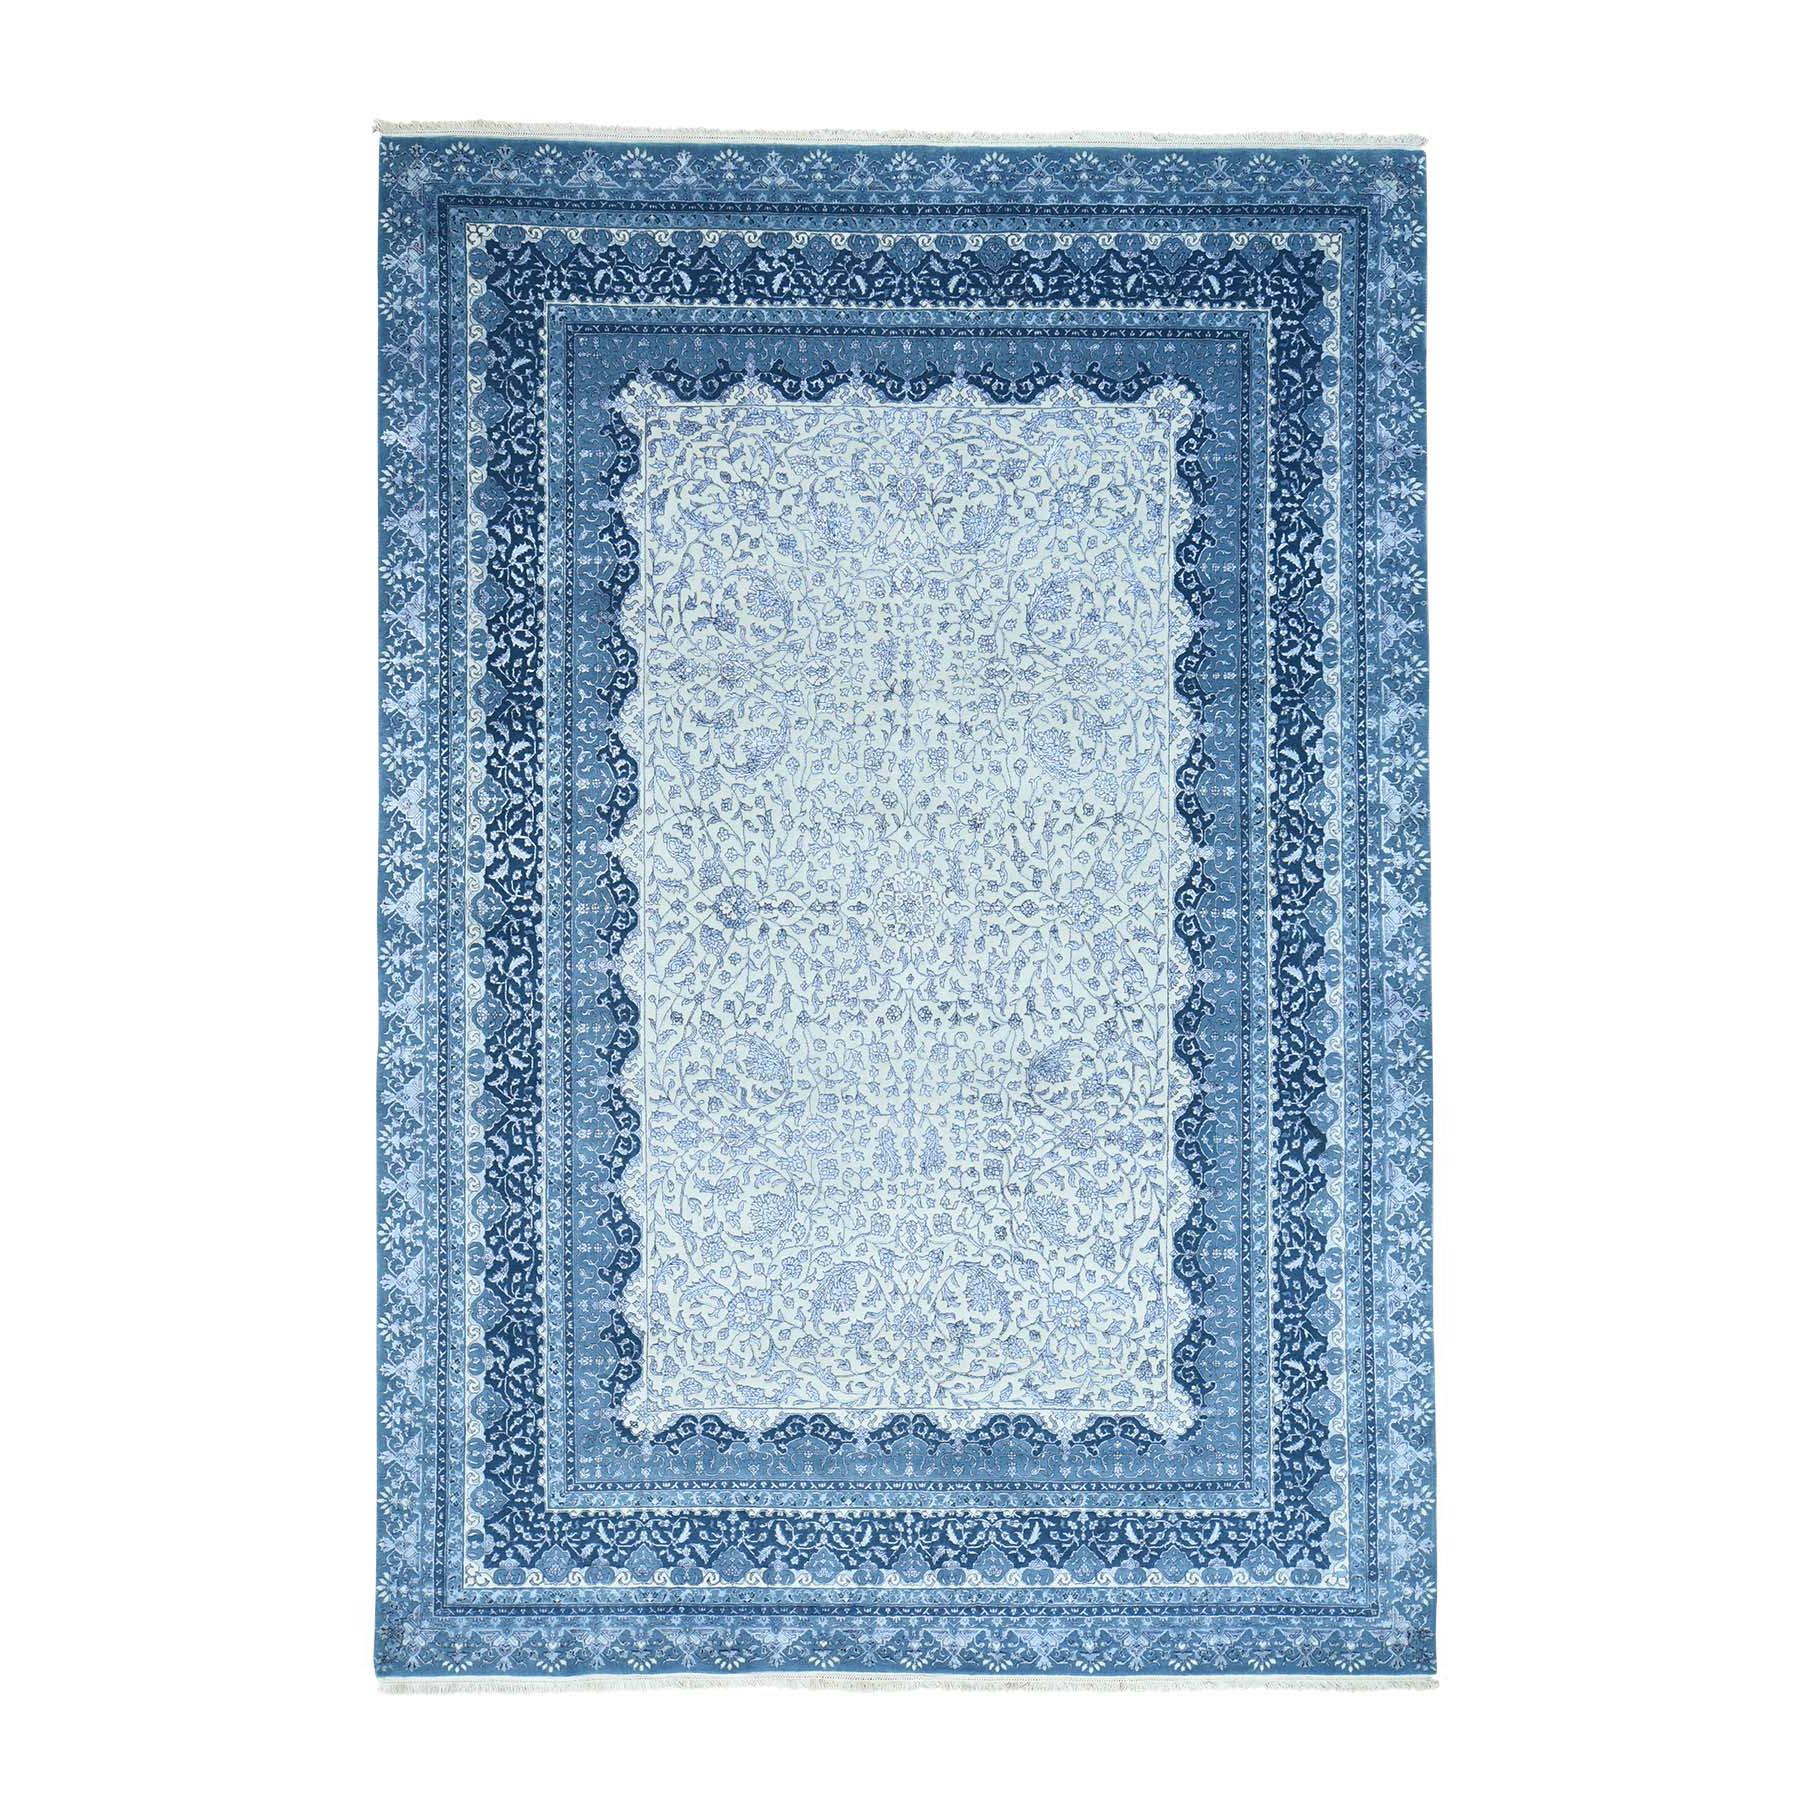 "7'10""X11'5"" Hand-Knotted Kashan Half Wool Half Silk 300 Kpsi Rug moacbe66"